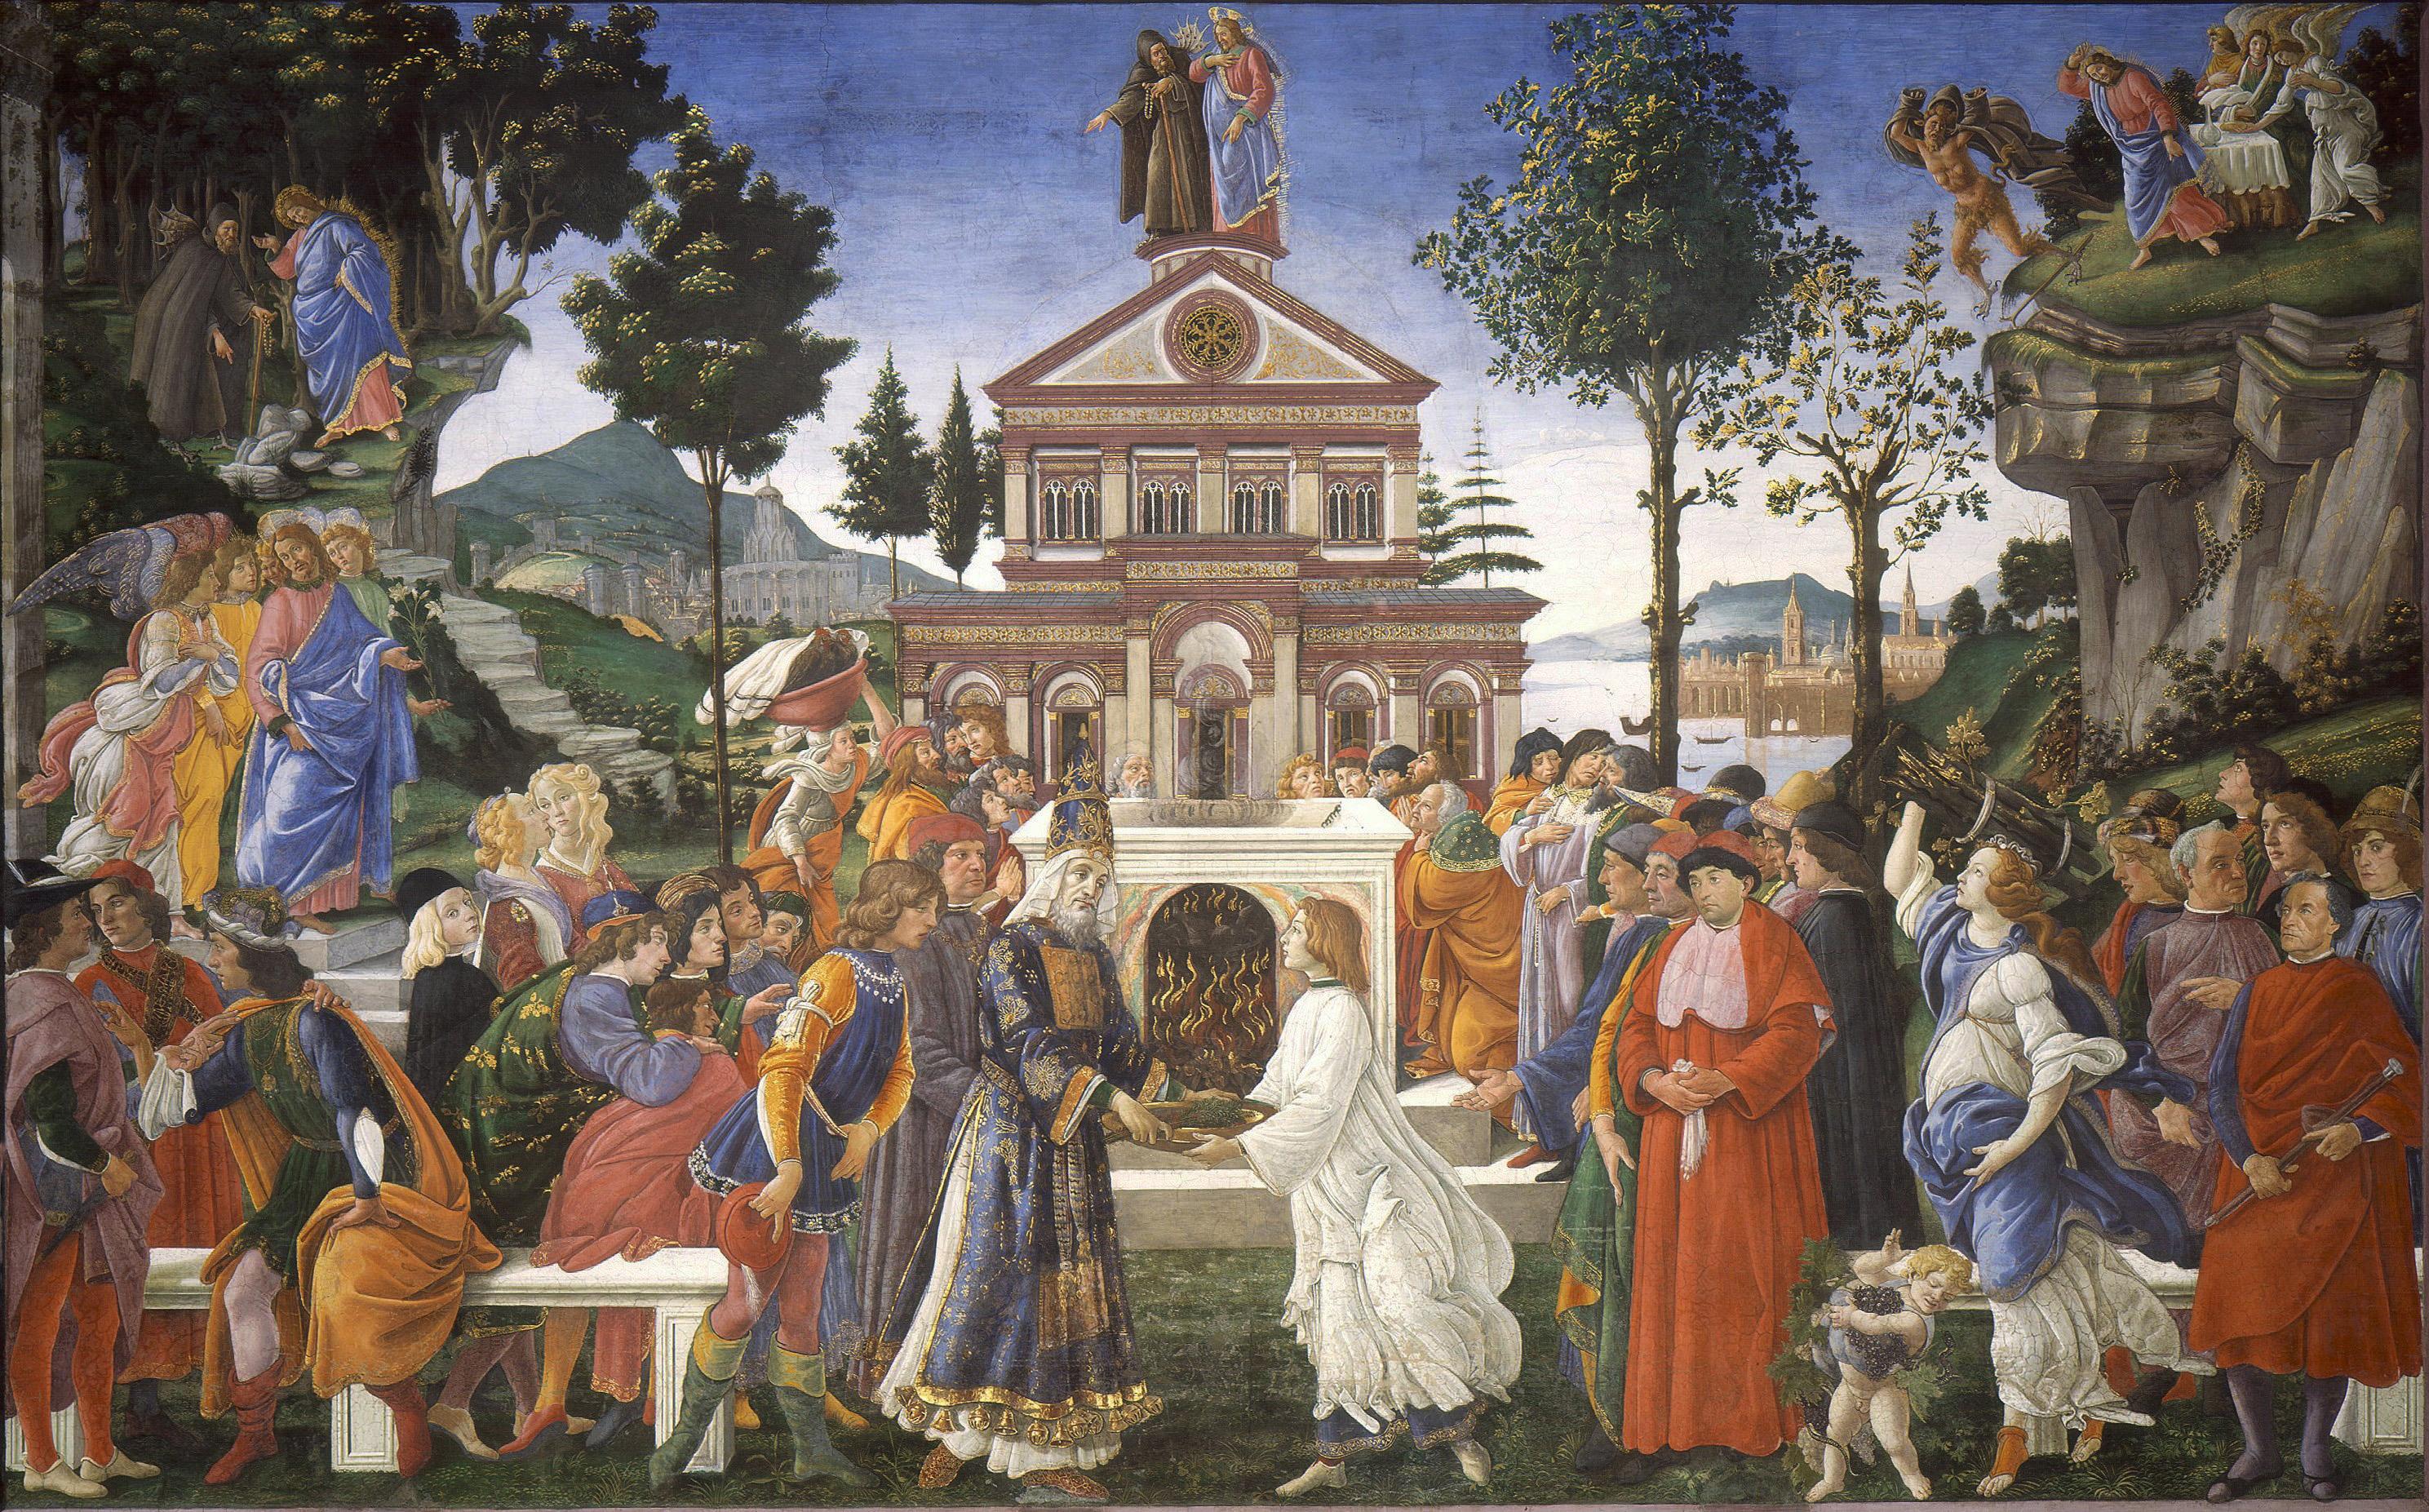 BOTTICELLI TEMPTATION OF CHRIST